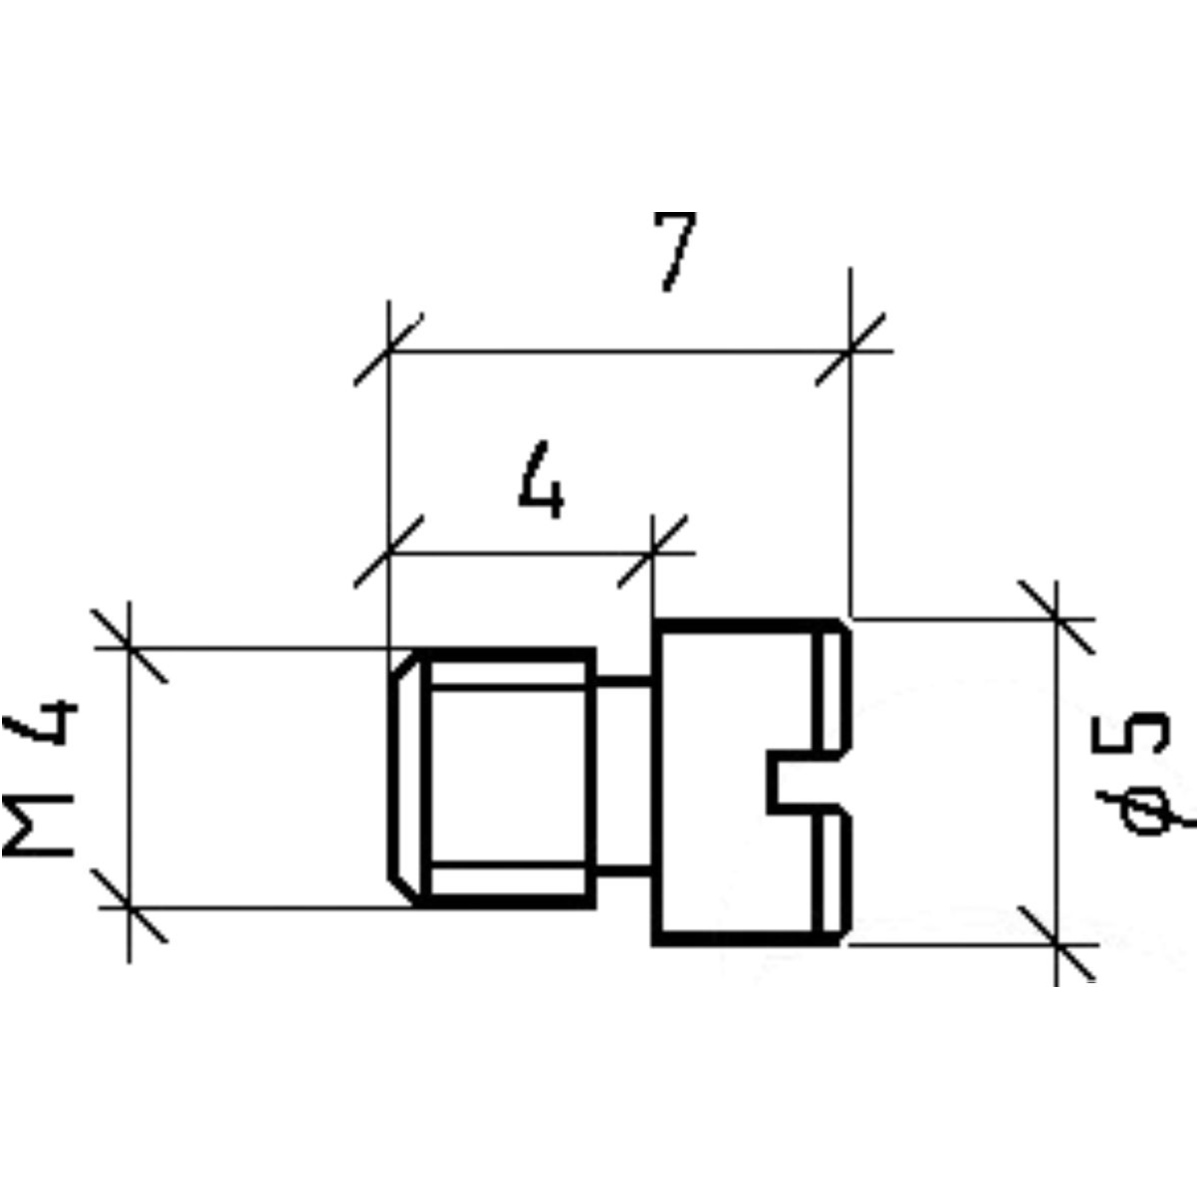 Main jet gr 70 m4 für Giantco Sprint City 50 HY50QT-3 2009-2015, 3 M Carburetor Schematic Diagram on